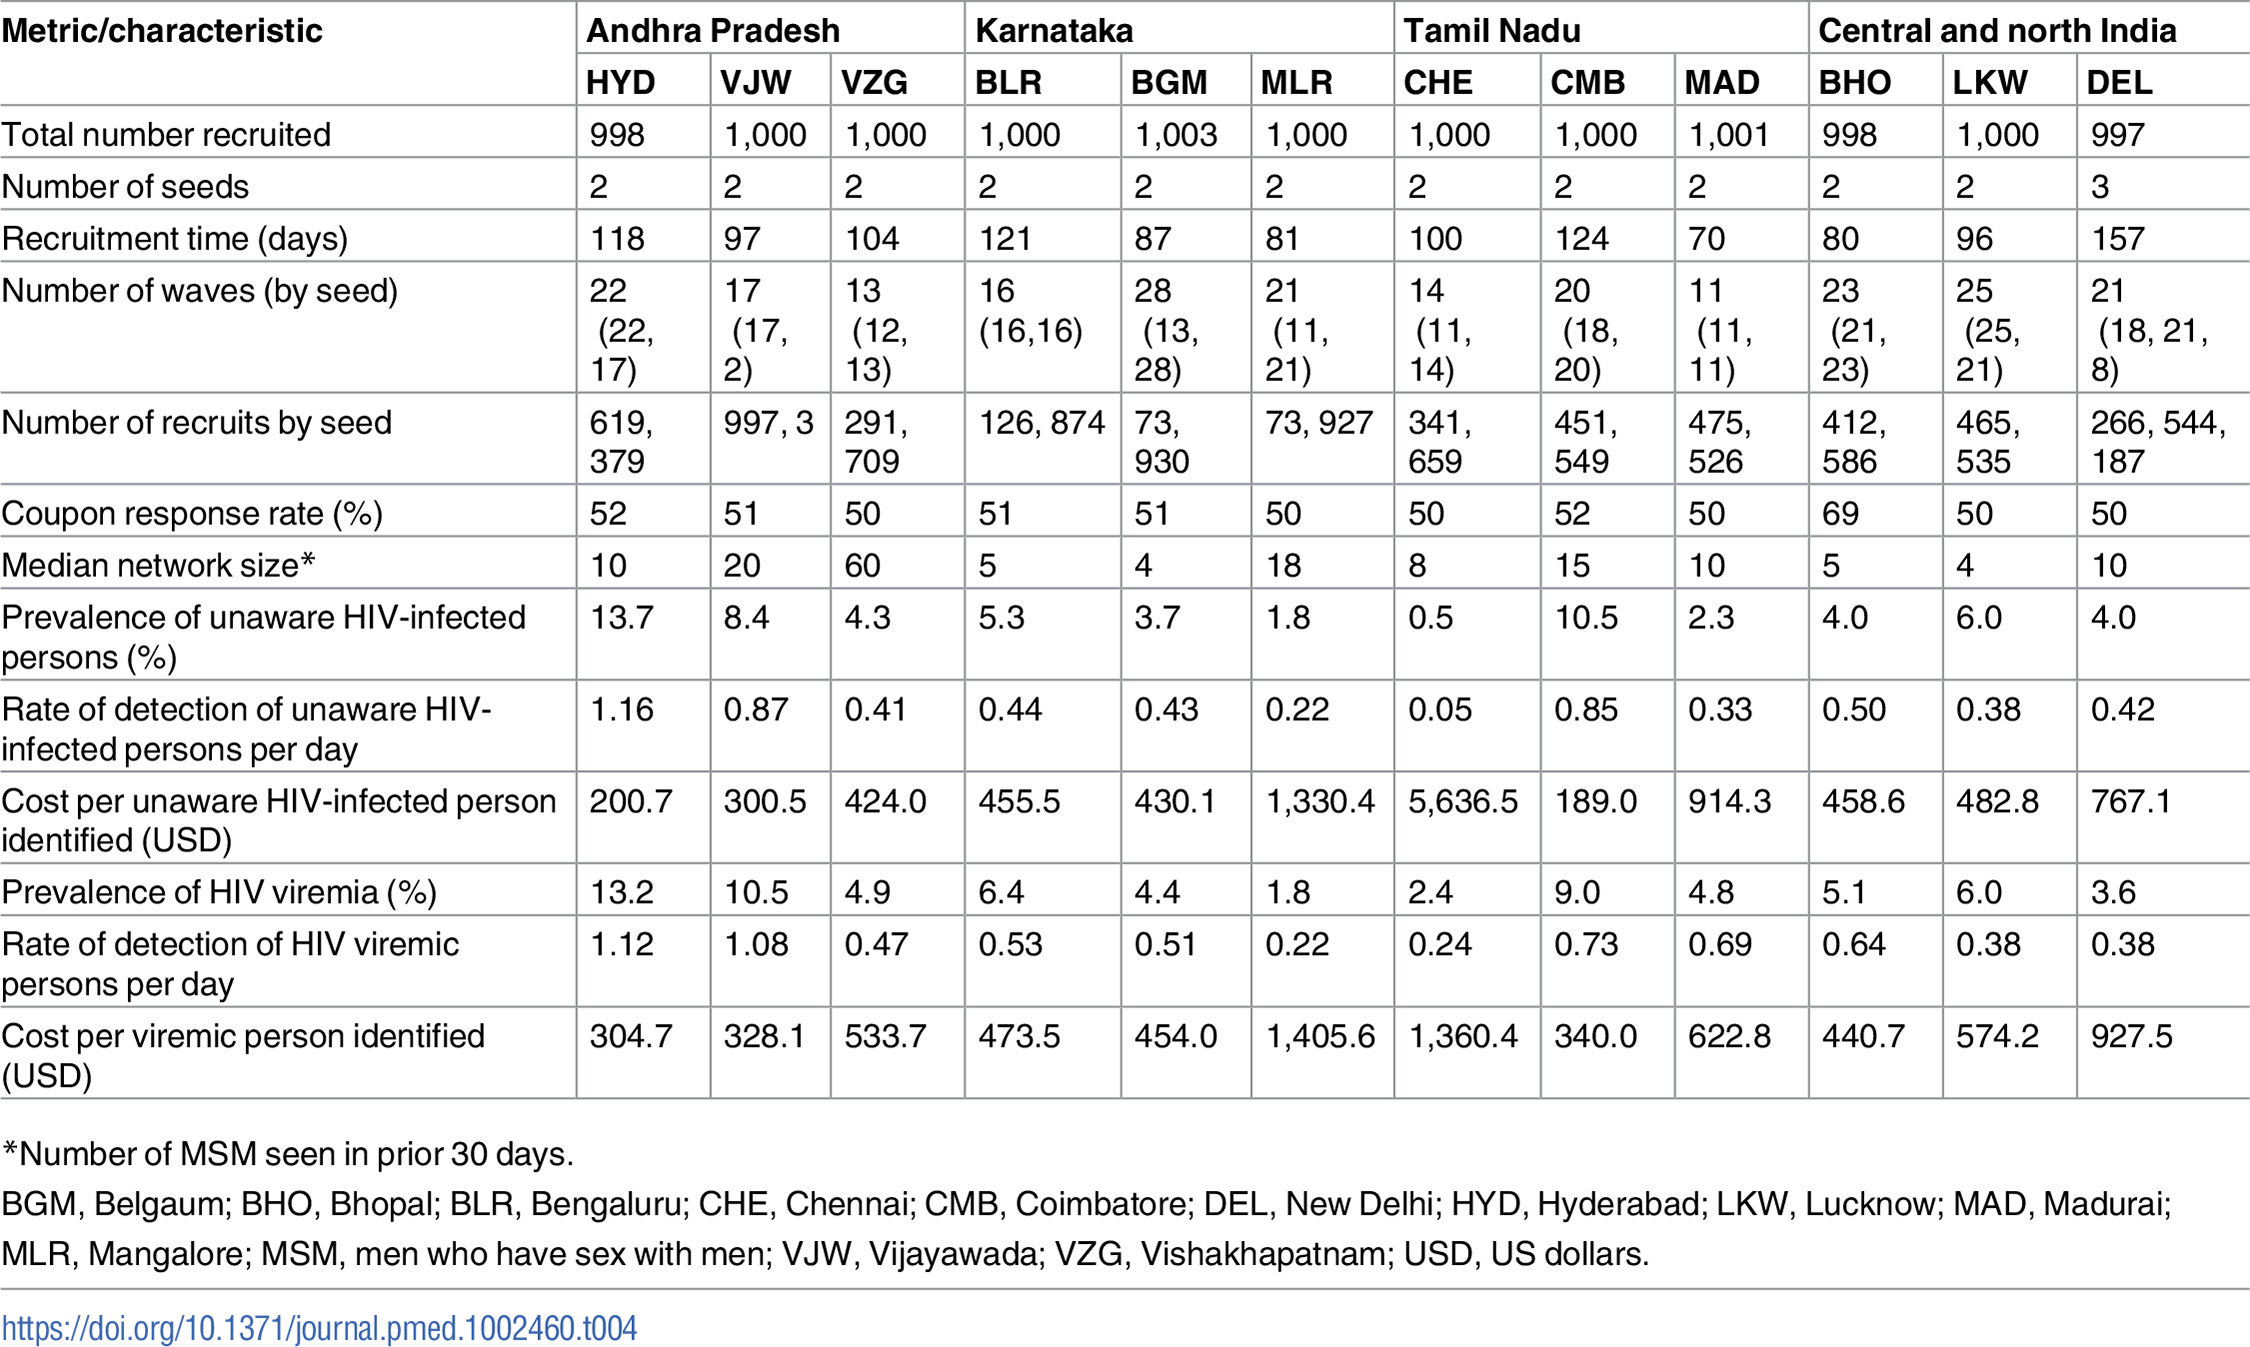 Respondent-driven sampling recruitment metrics and HIV characteristics across MSM sites.